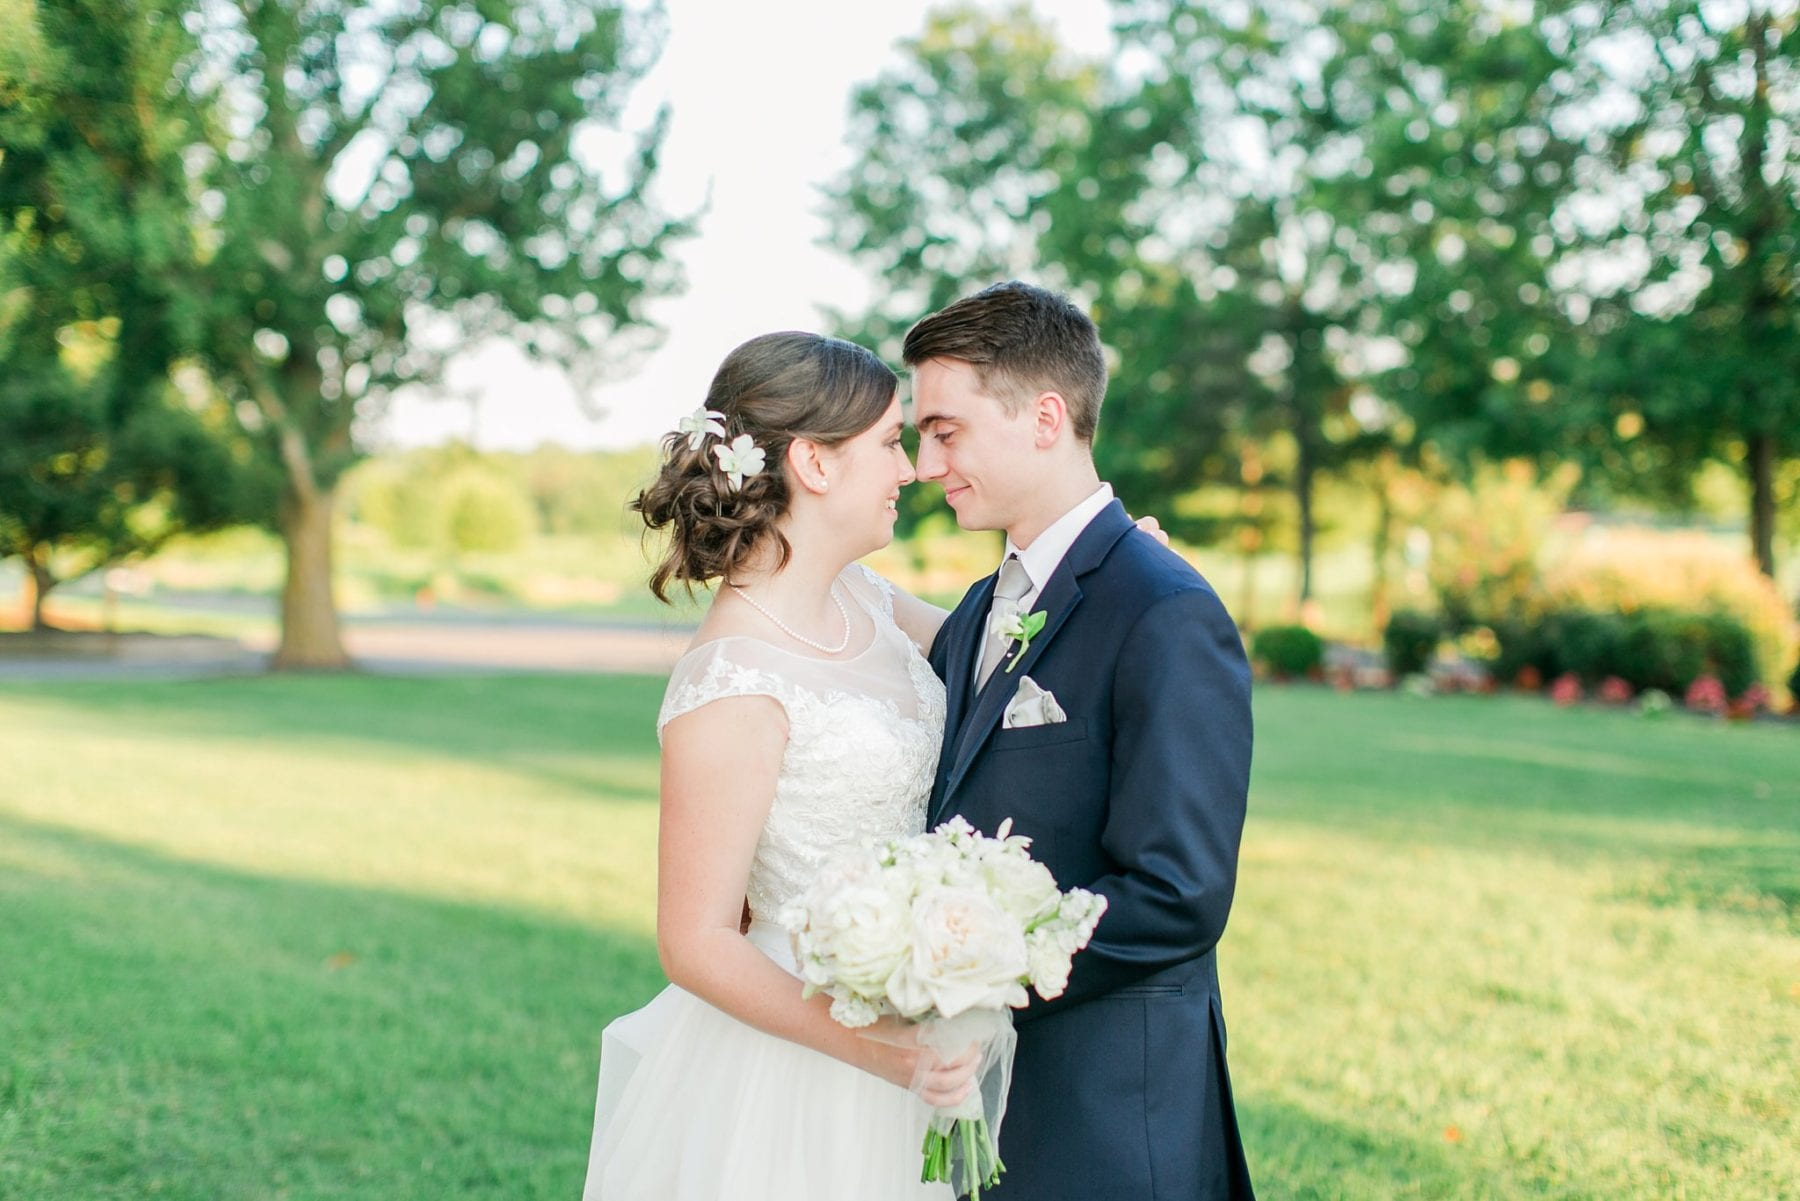 Bristow Manor Wedding Photos Virginia Wedding Photographer Lauren & Andrew Megan Kelsey Photography-525.jpg